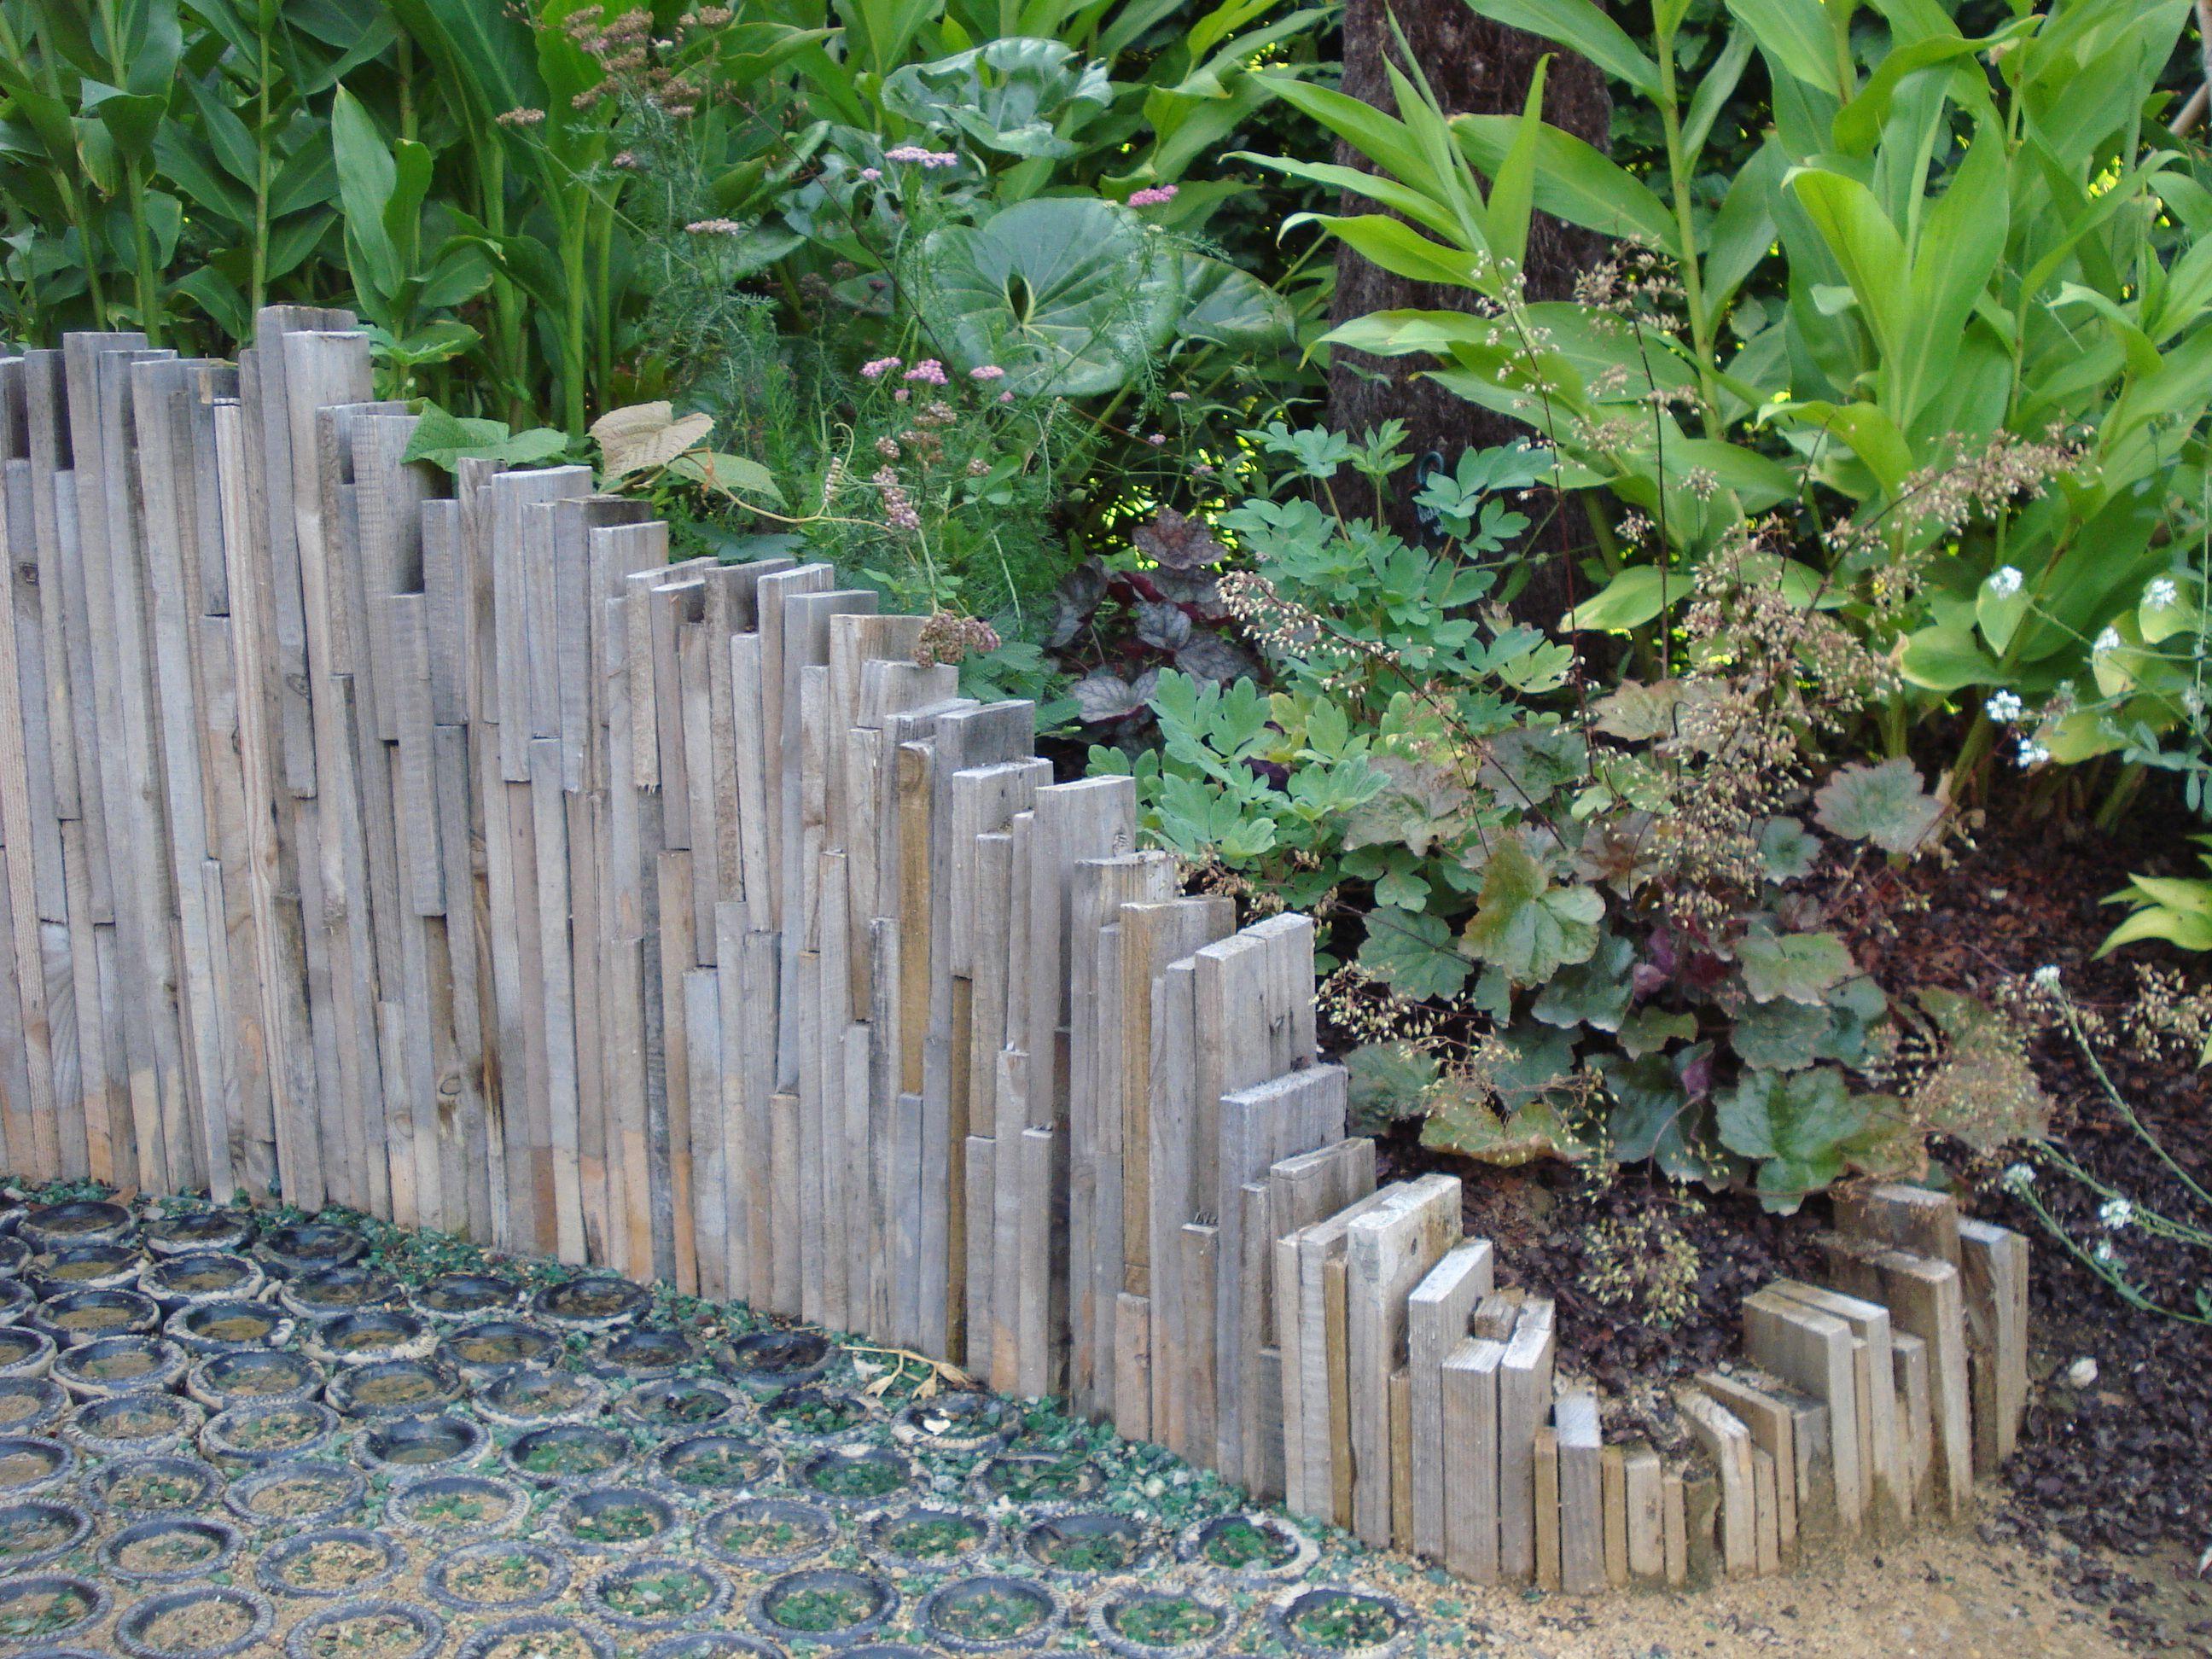 Bordure Jardin Ecolat | Bordures De Jardin 20 Idées Originales ...